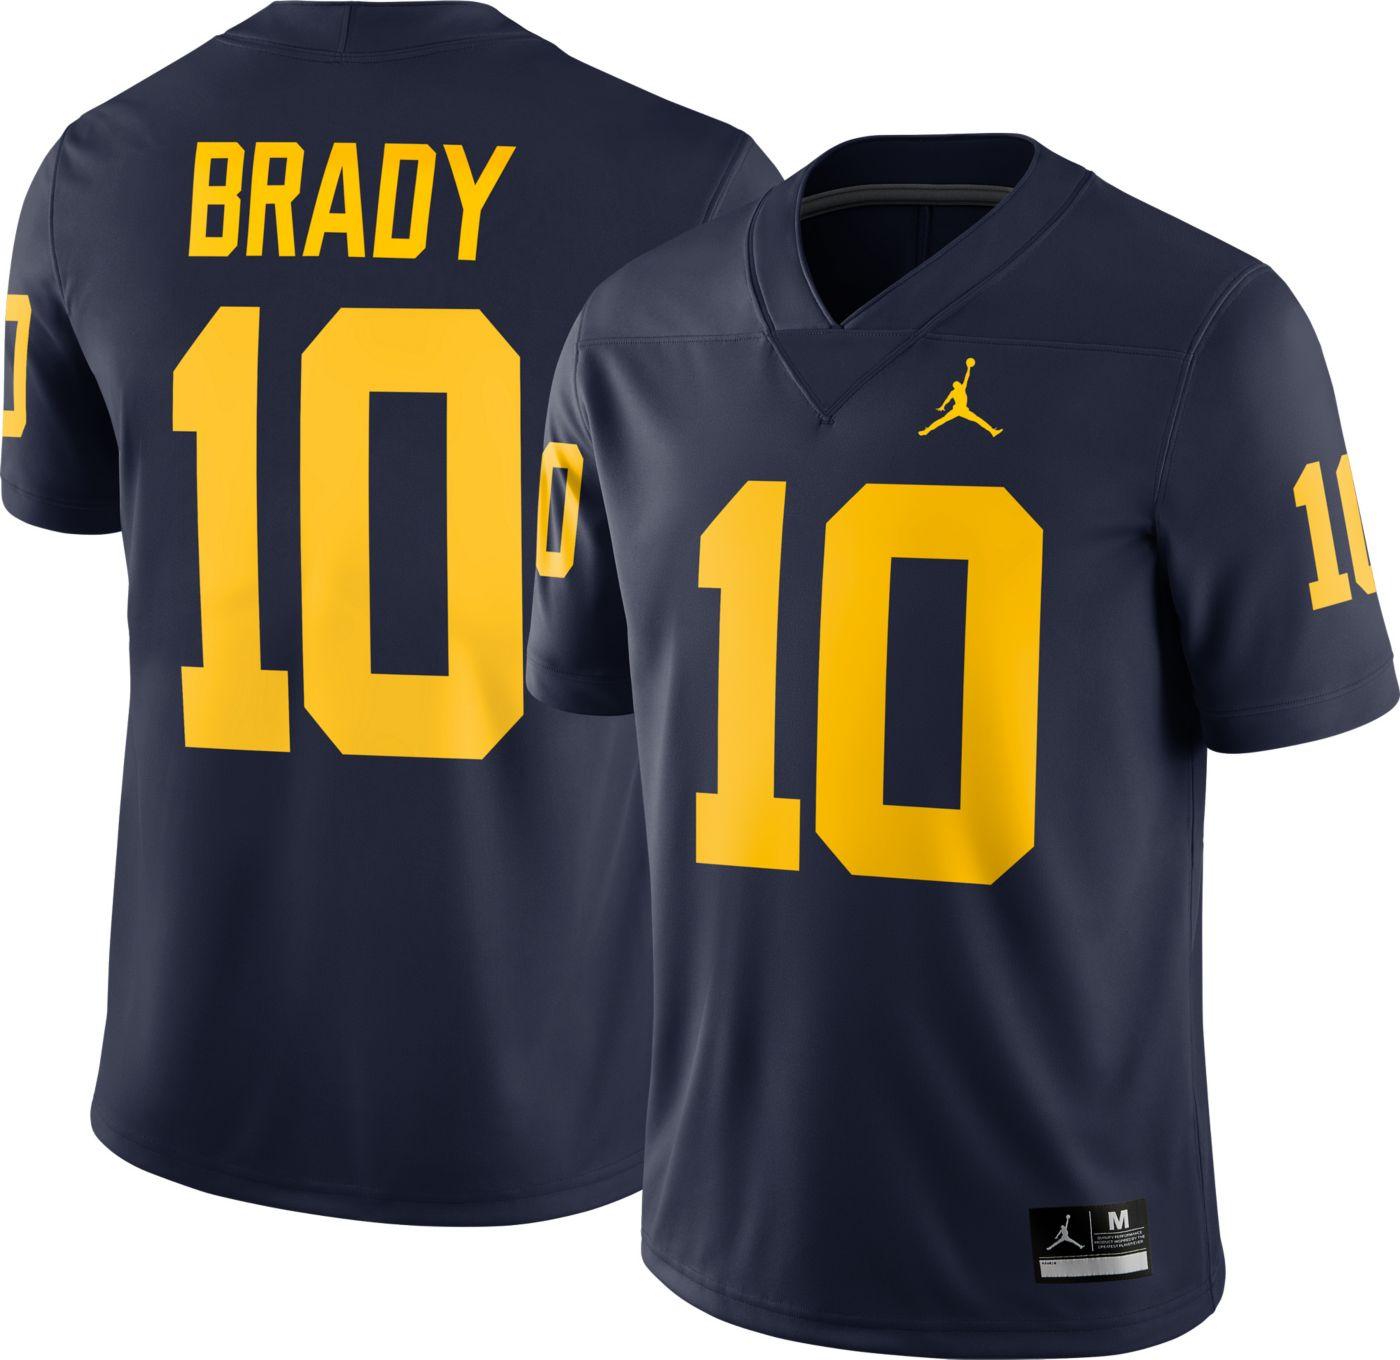 Jordan Men's Tom Brady Michigan Wolverines #10 Blue Dri-FIT Game Football Jersey